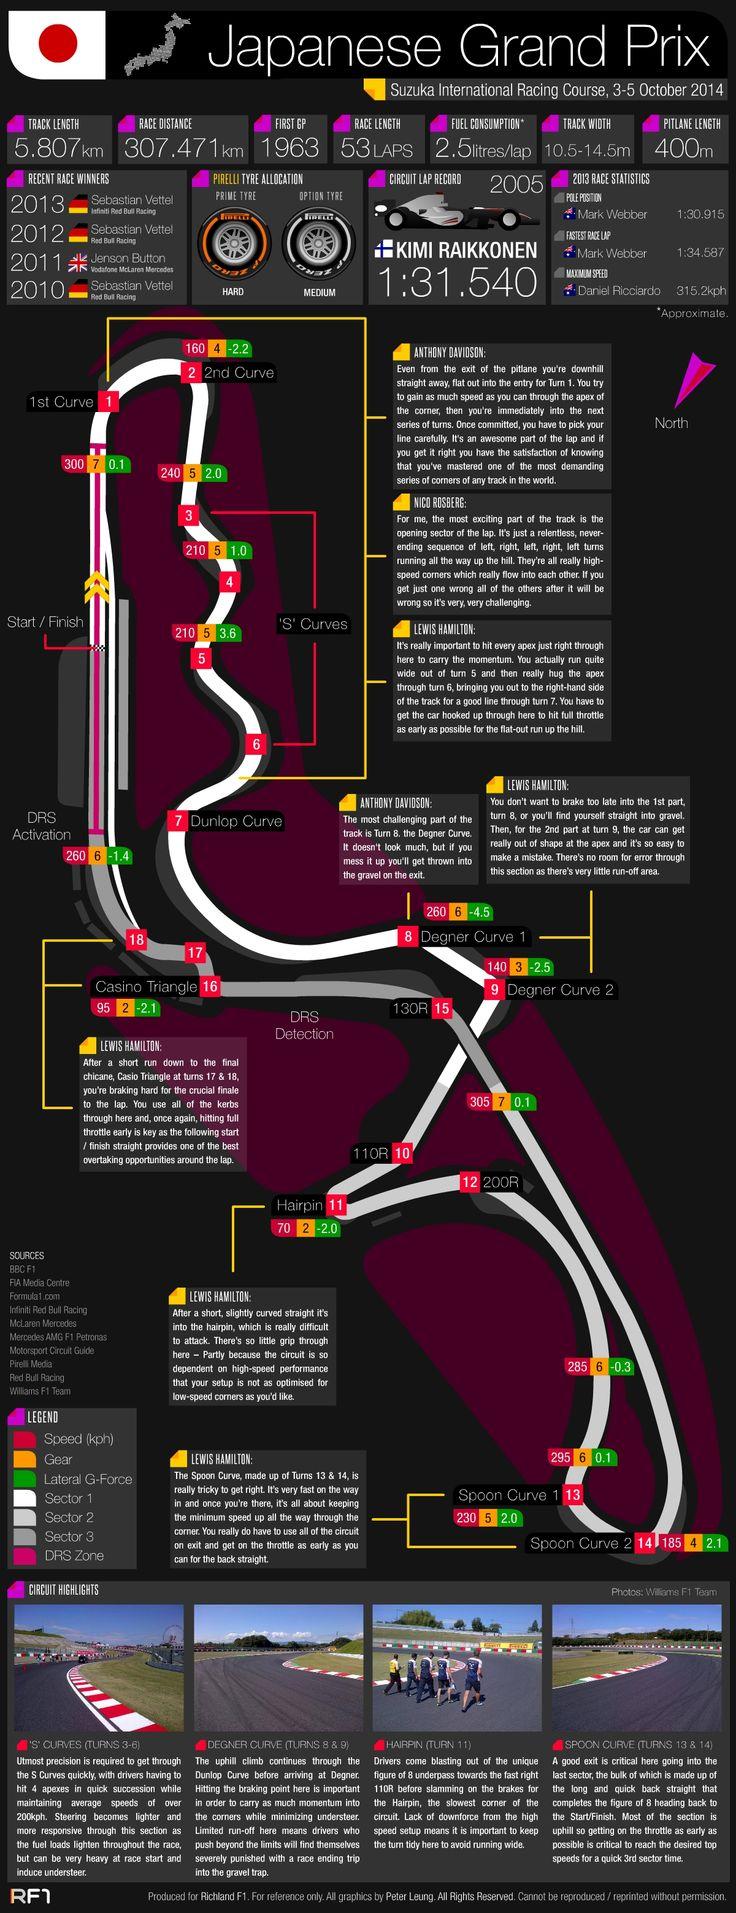 ♠ Grand Prix Guide – 2014 Japanese Grand Prix #F1 #Infographic #Data